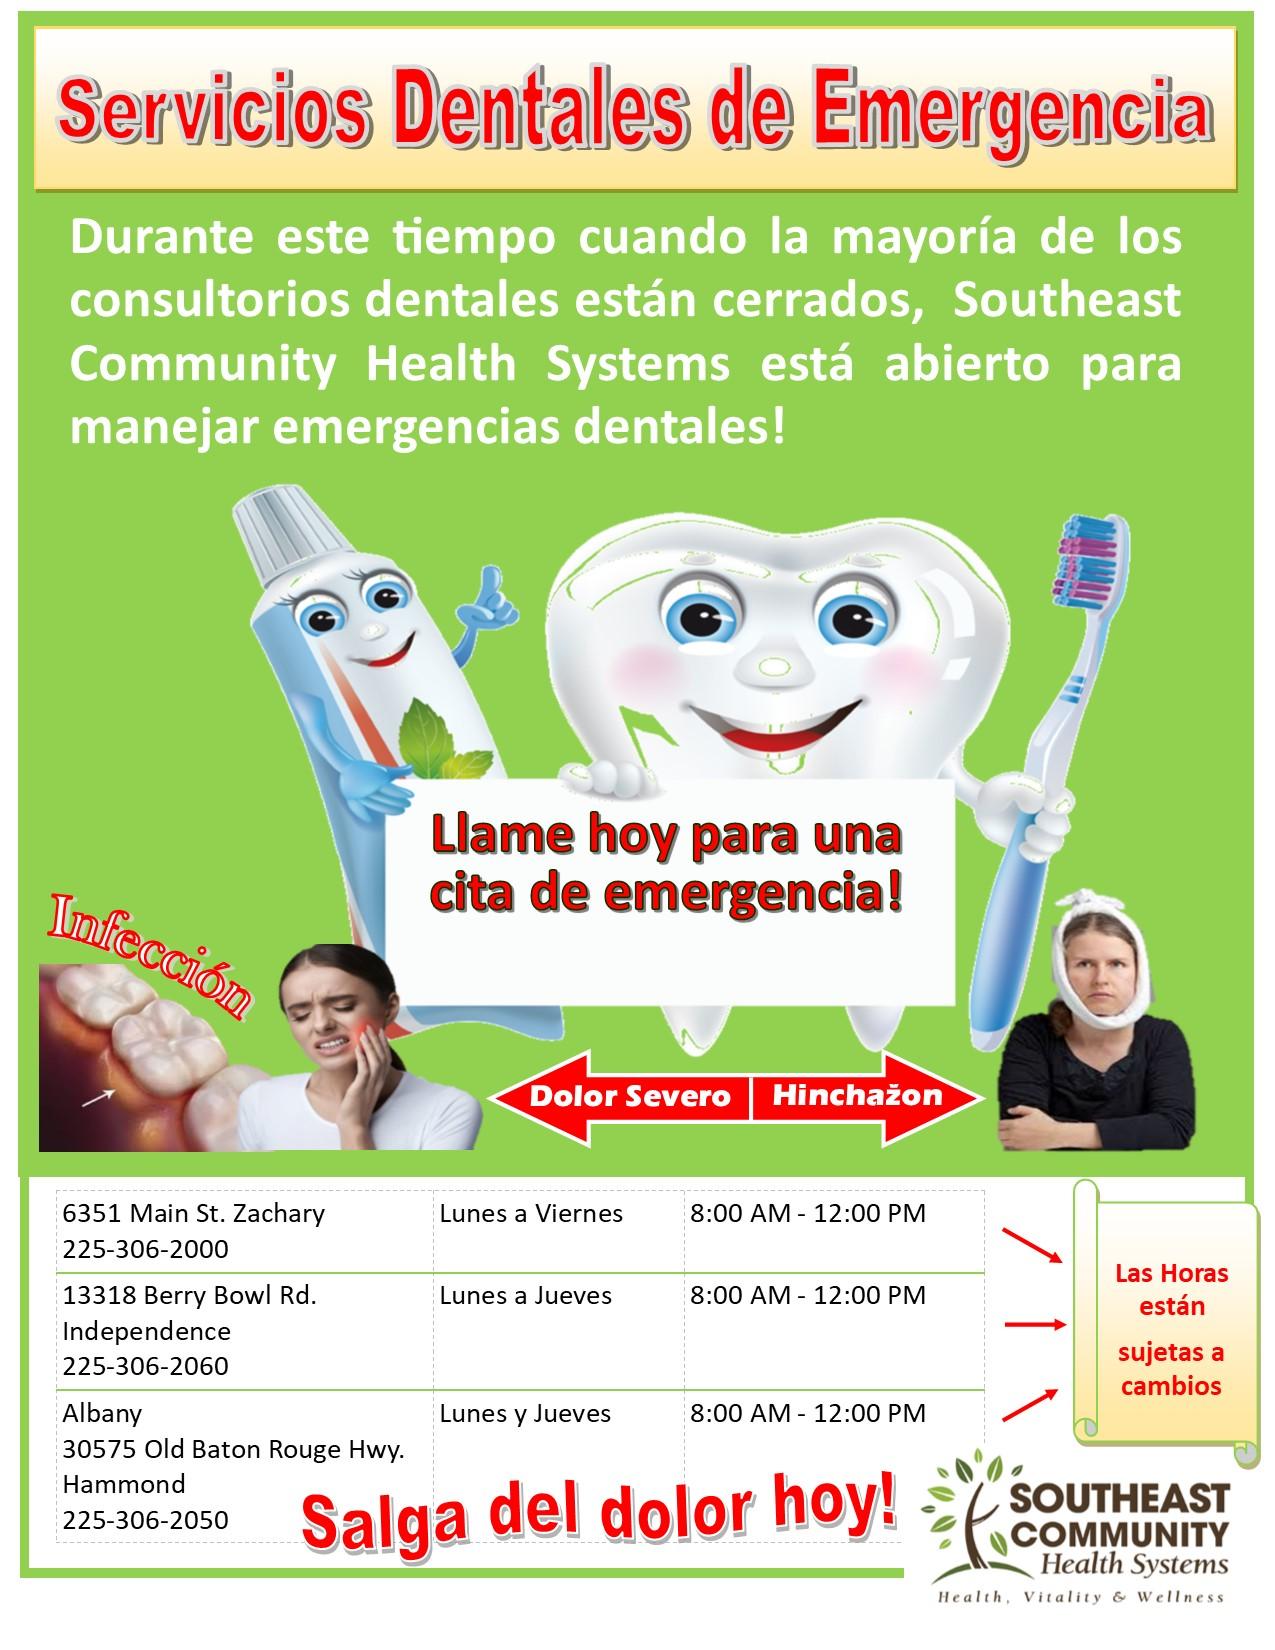 SCHS_COVID-19 Dental Flyer spanish_4-02-2020